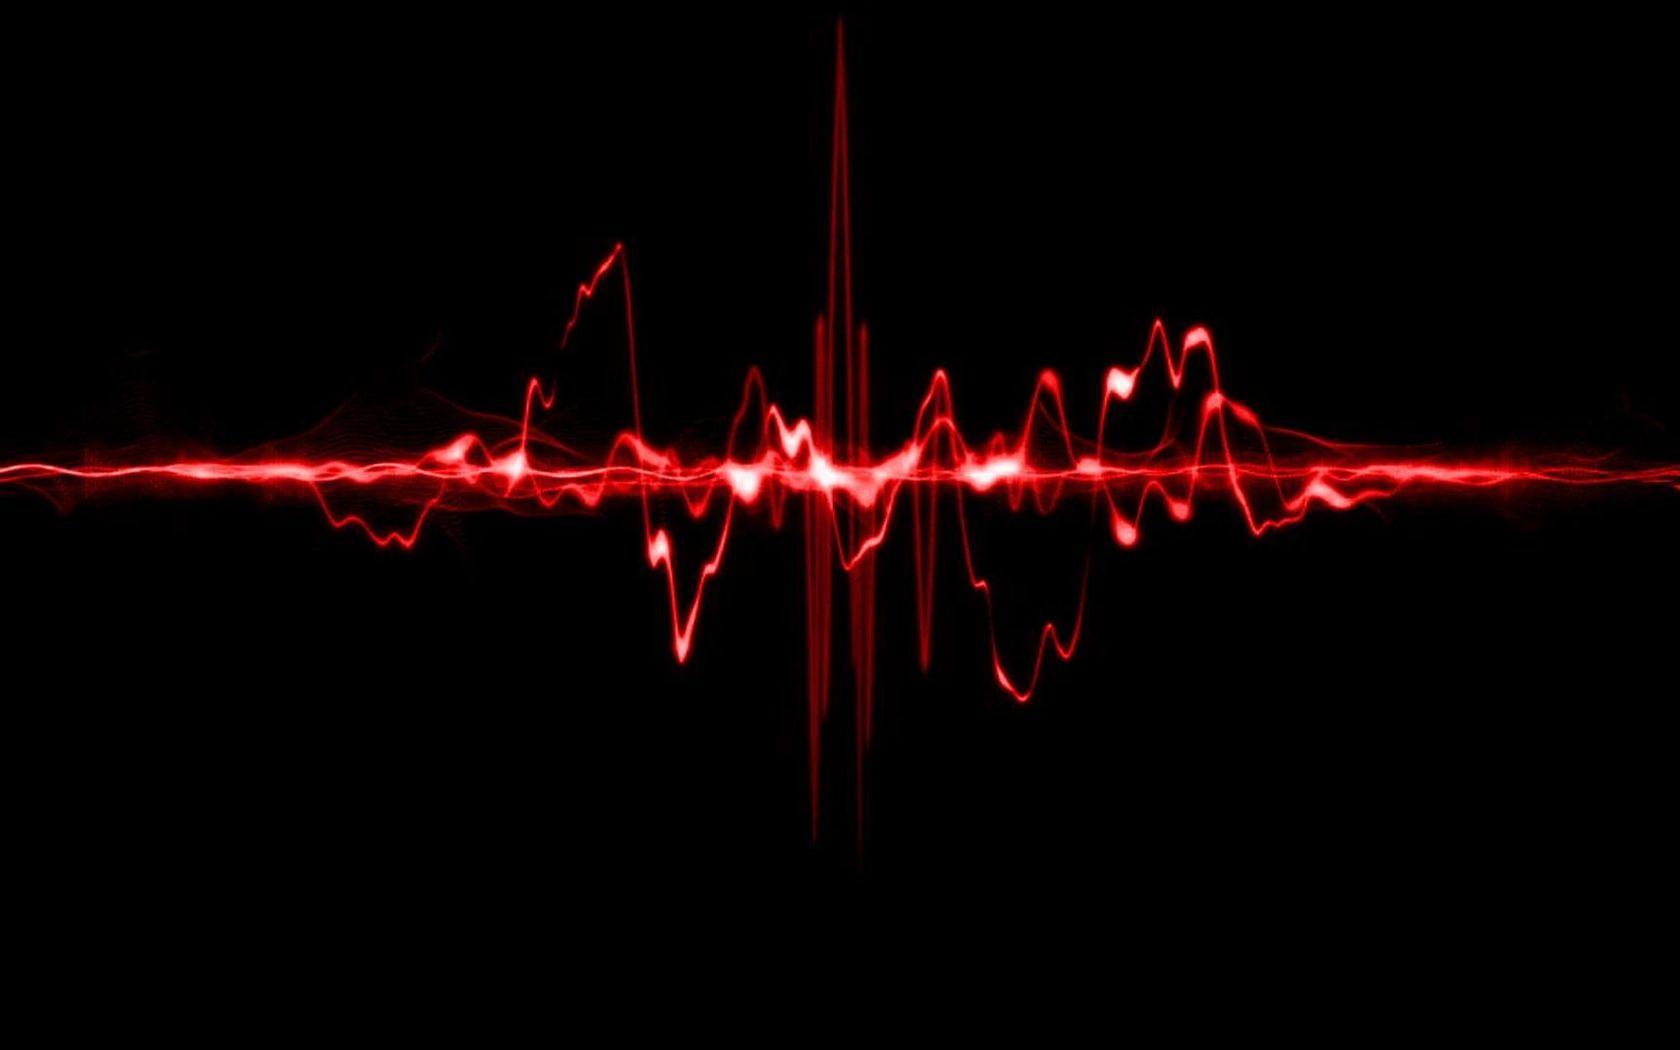 Sound wave wallpaper 7328 1680x1050